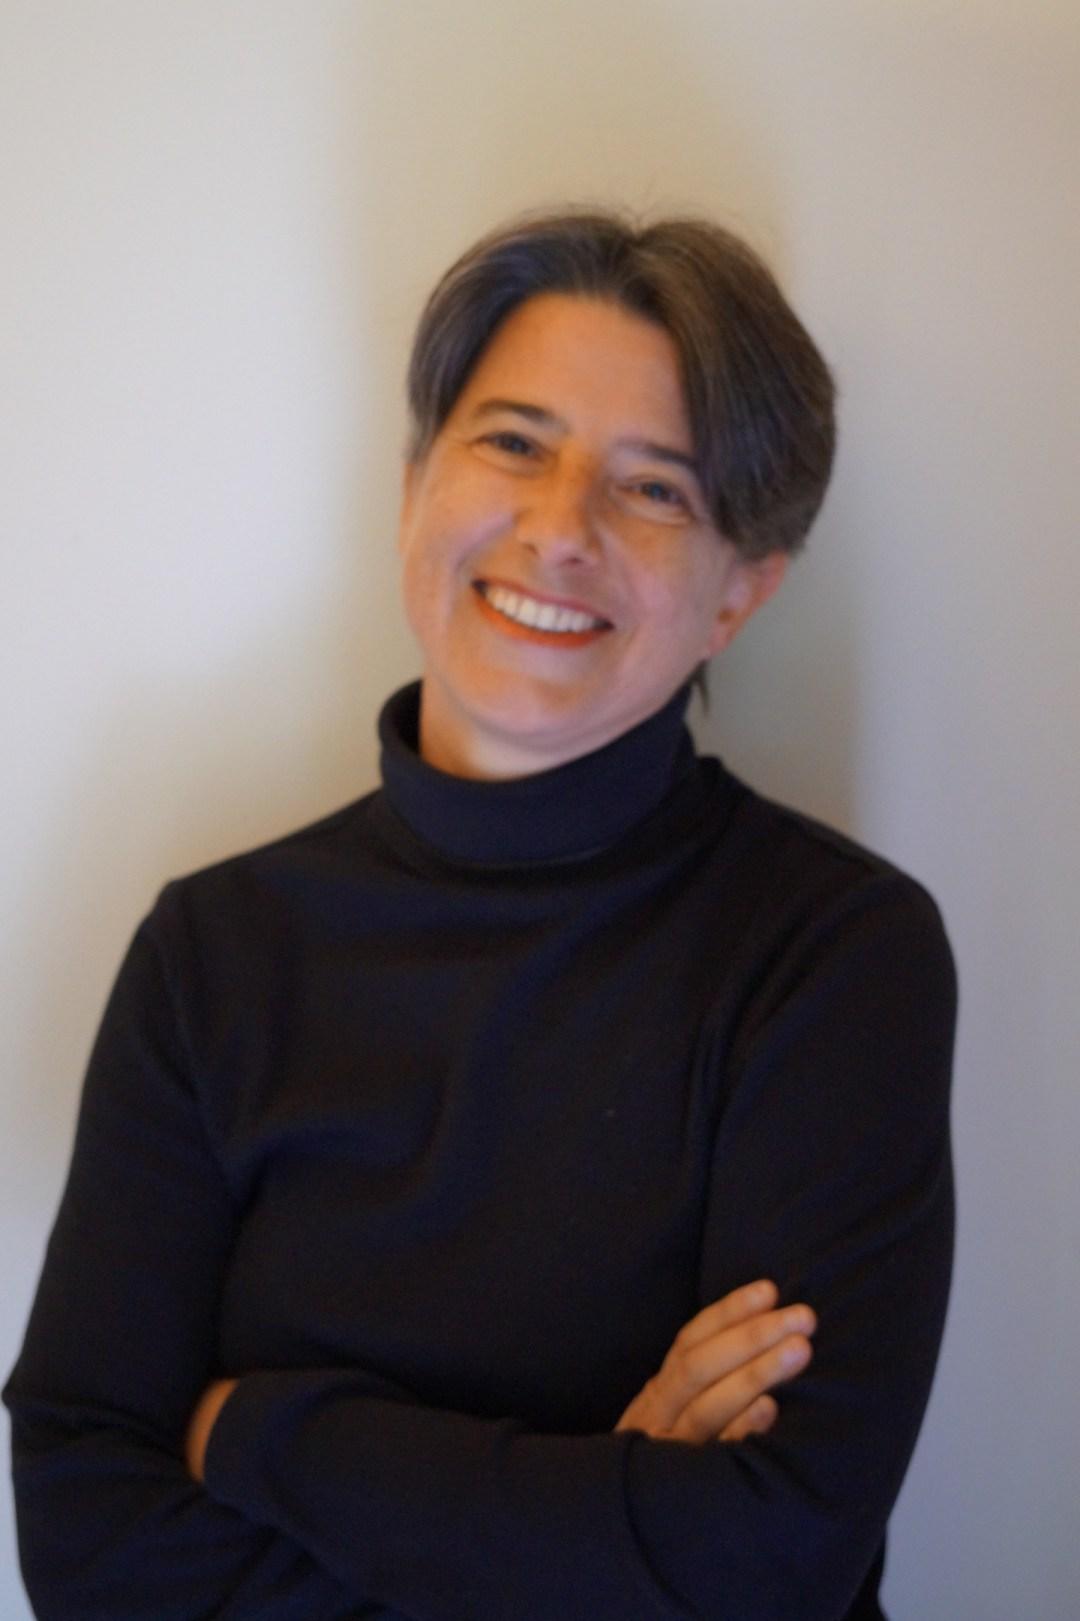 Monique Gliozzi, author